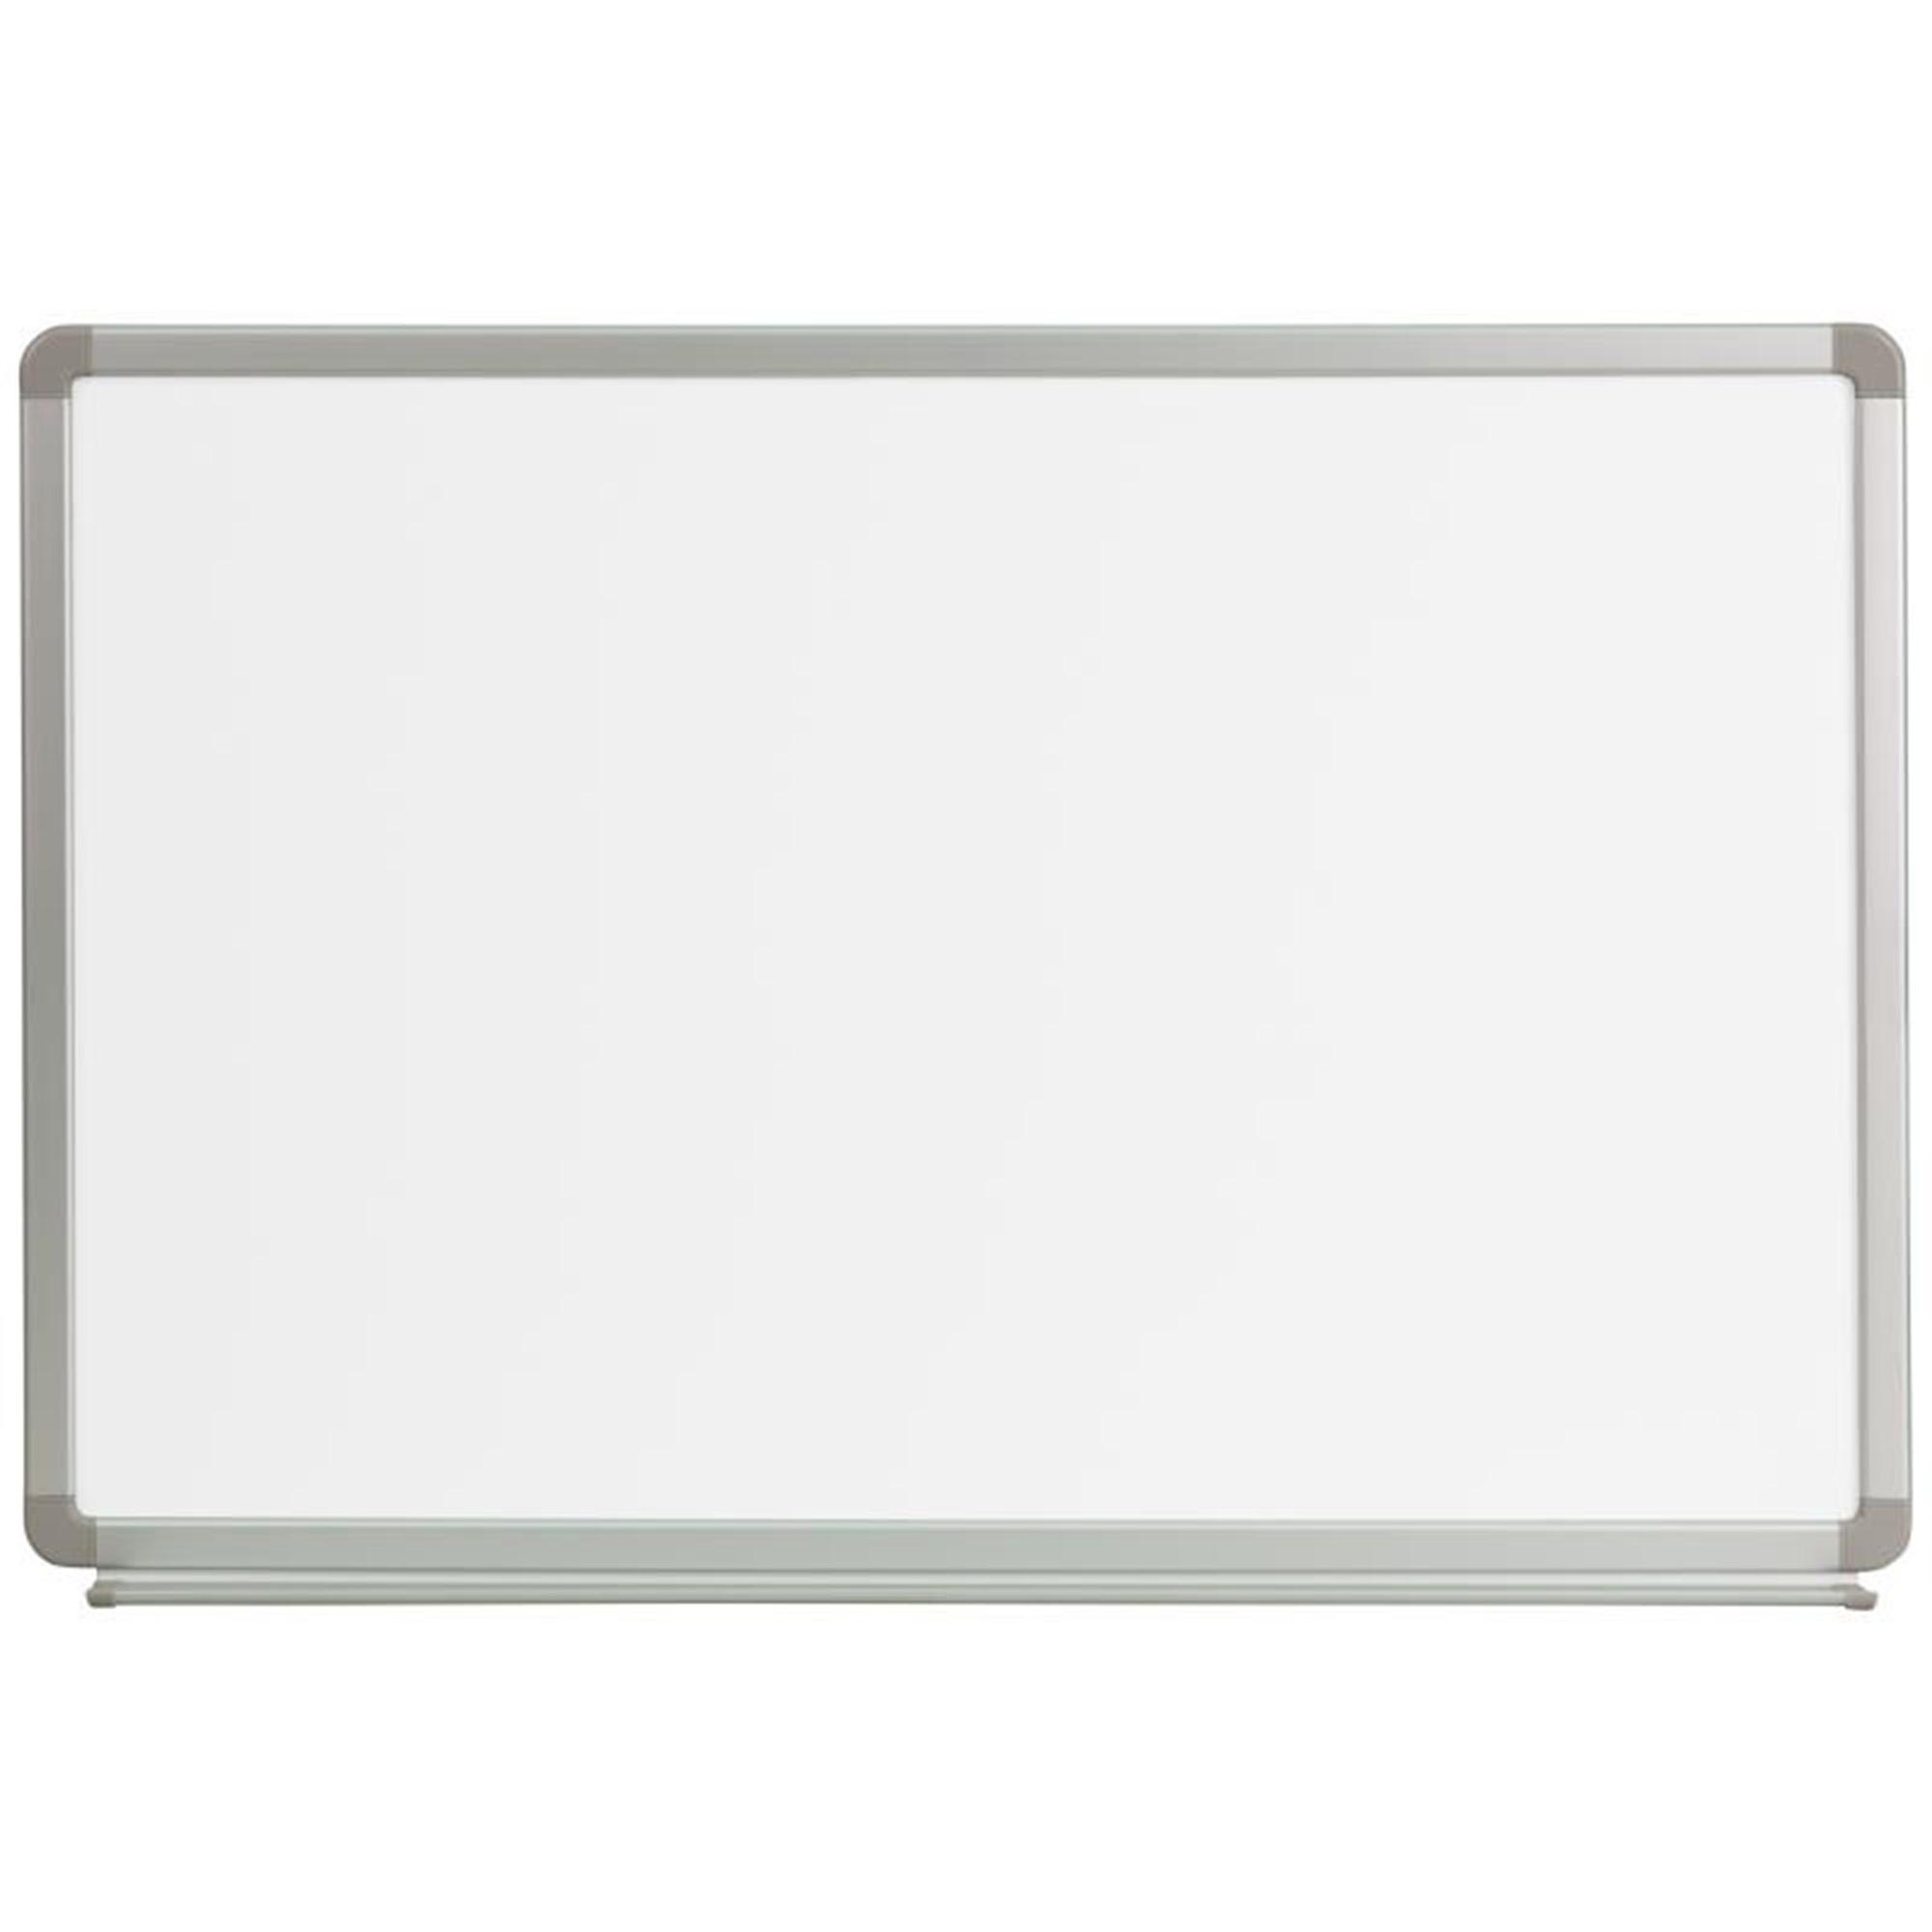 Offex 3' W x 2' H Magnetic Marker Board YU-60X90-WHITE-GG